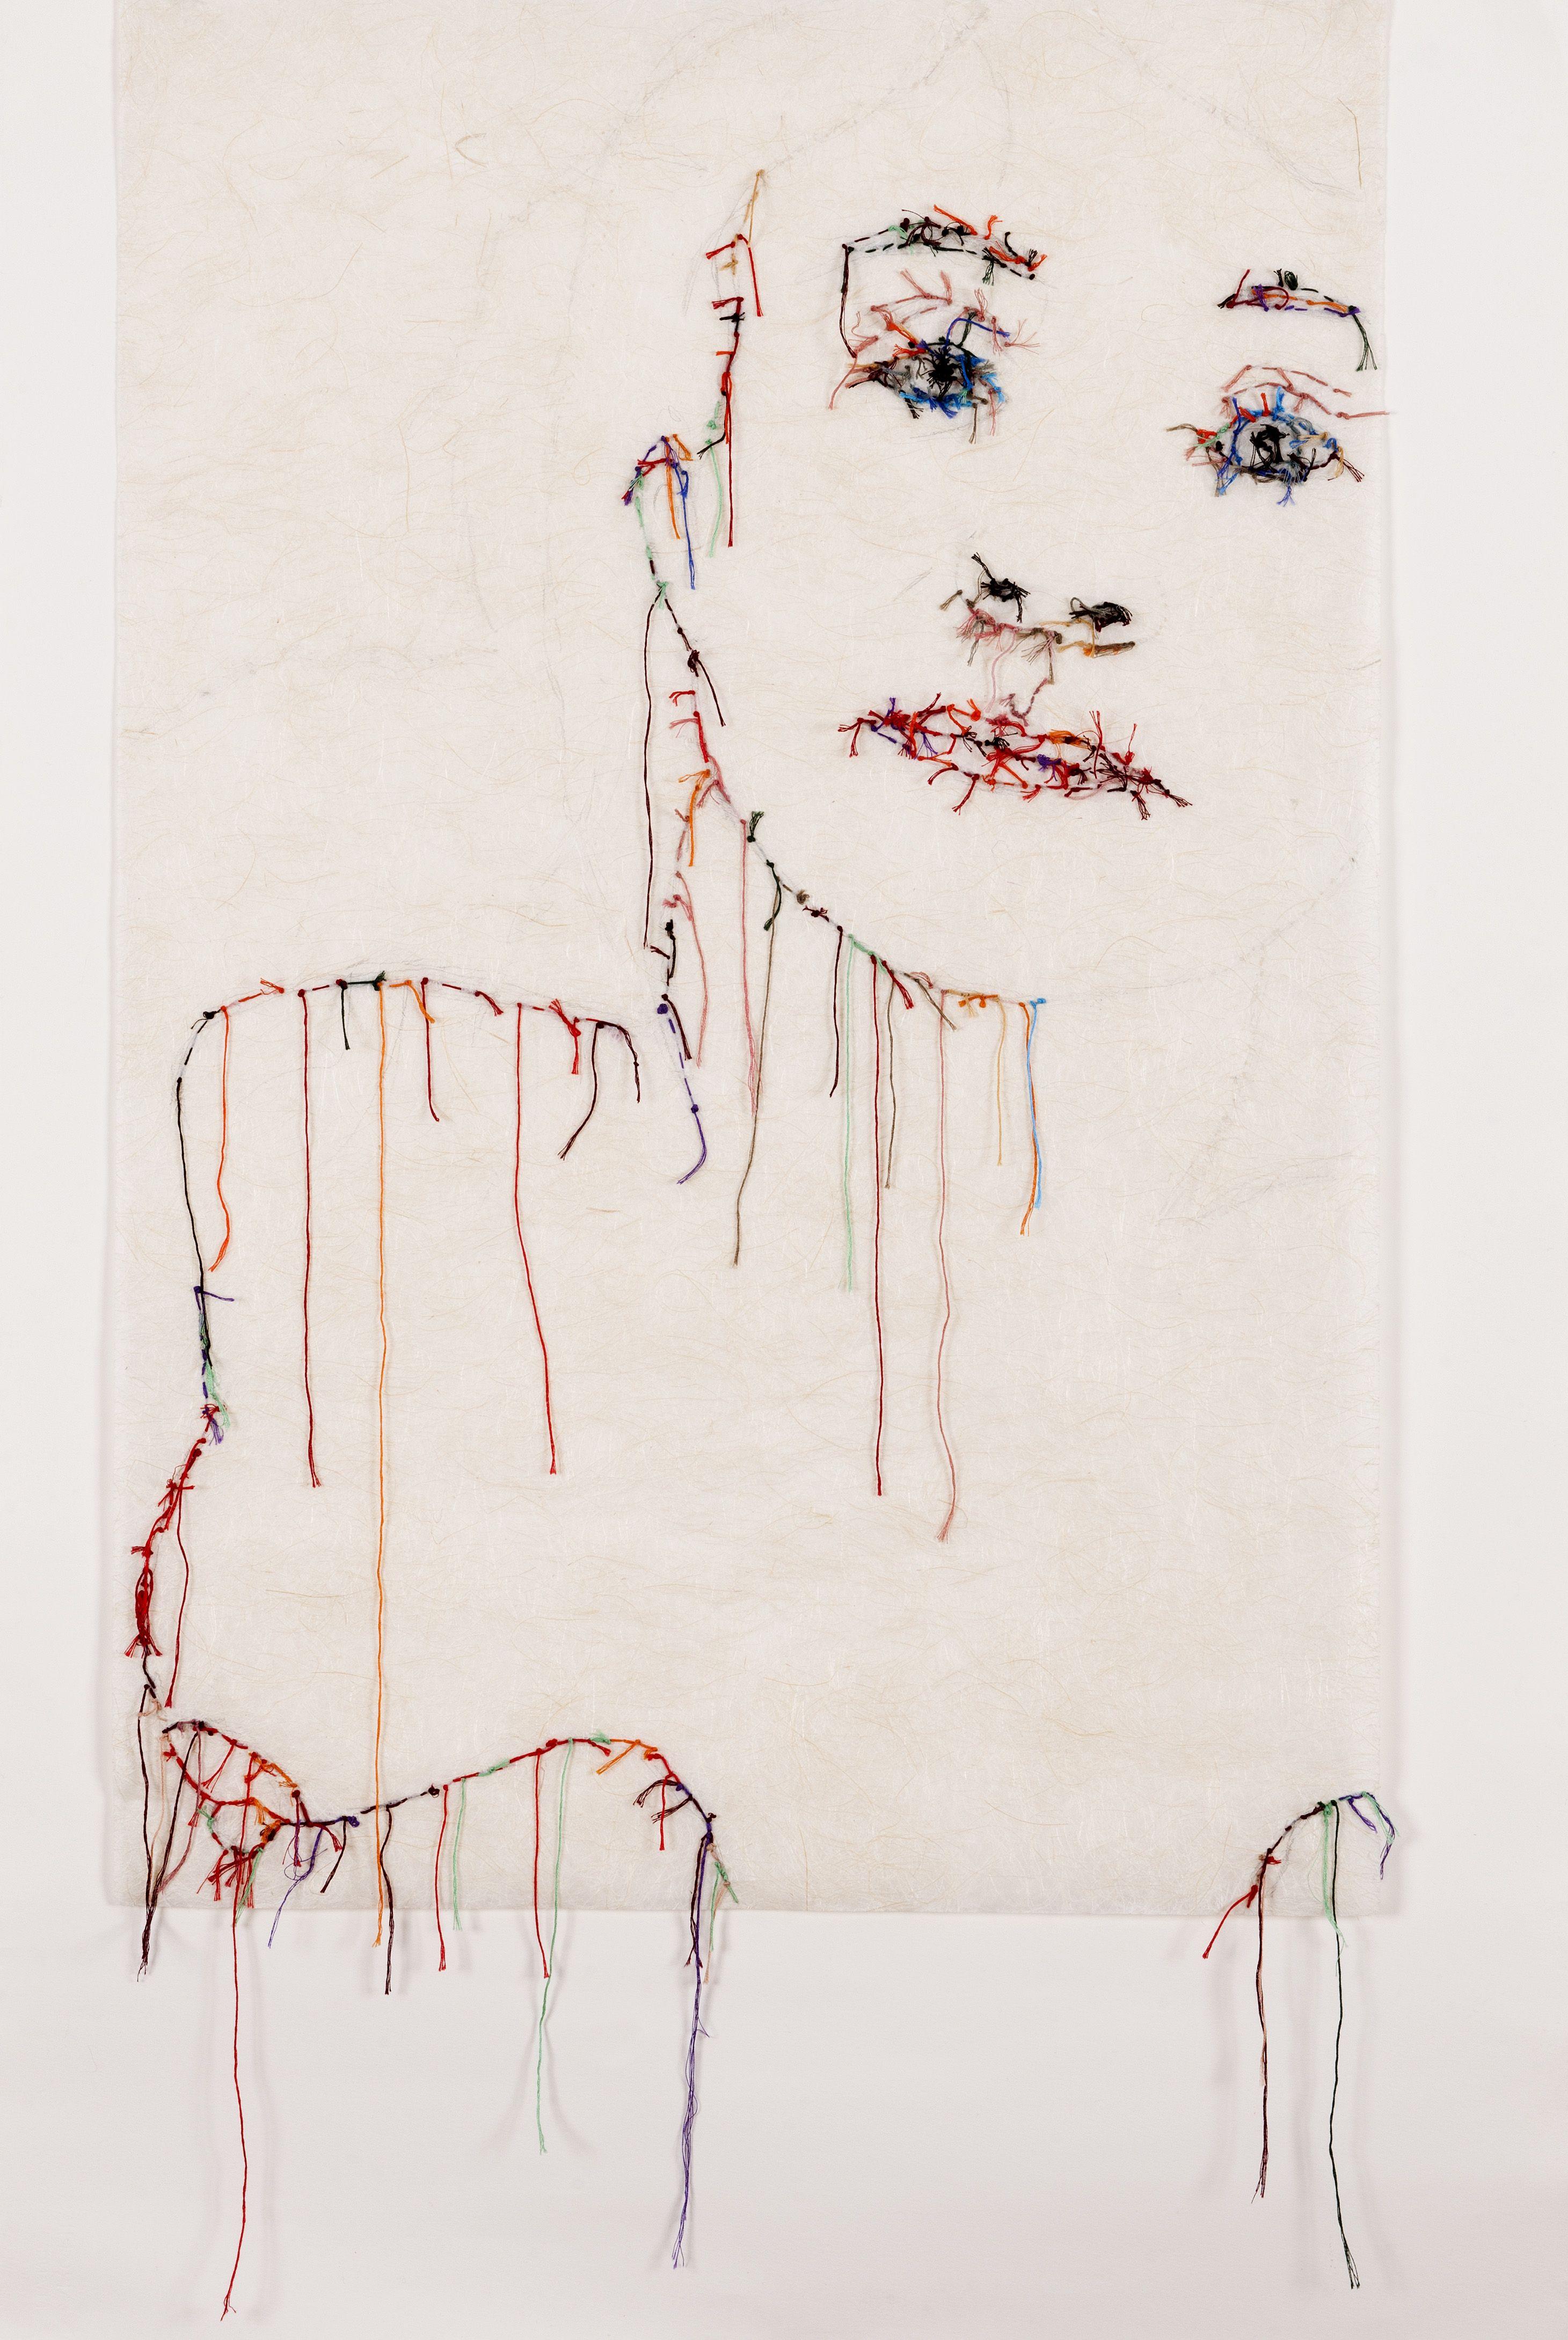 #autoportrait #guacolda #broderie Stitch Drawing, Thread Painting, Textile  Fiber Art,